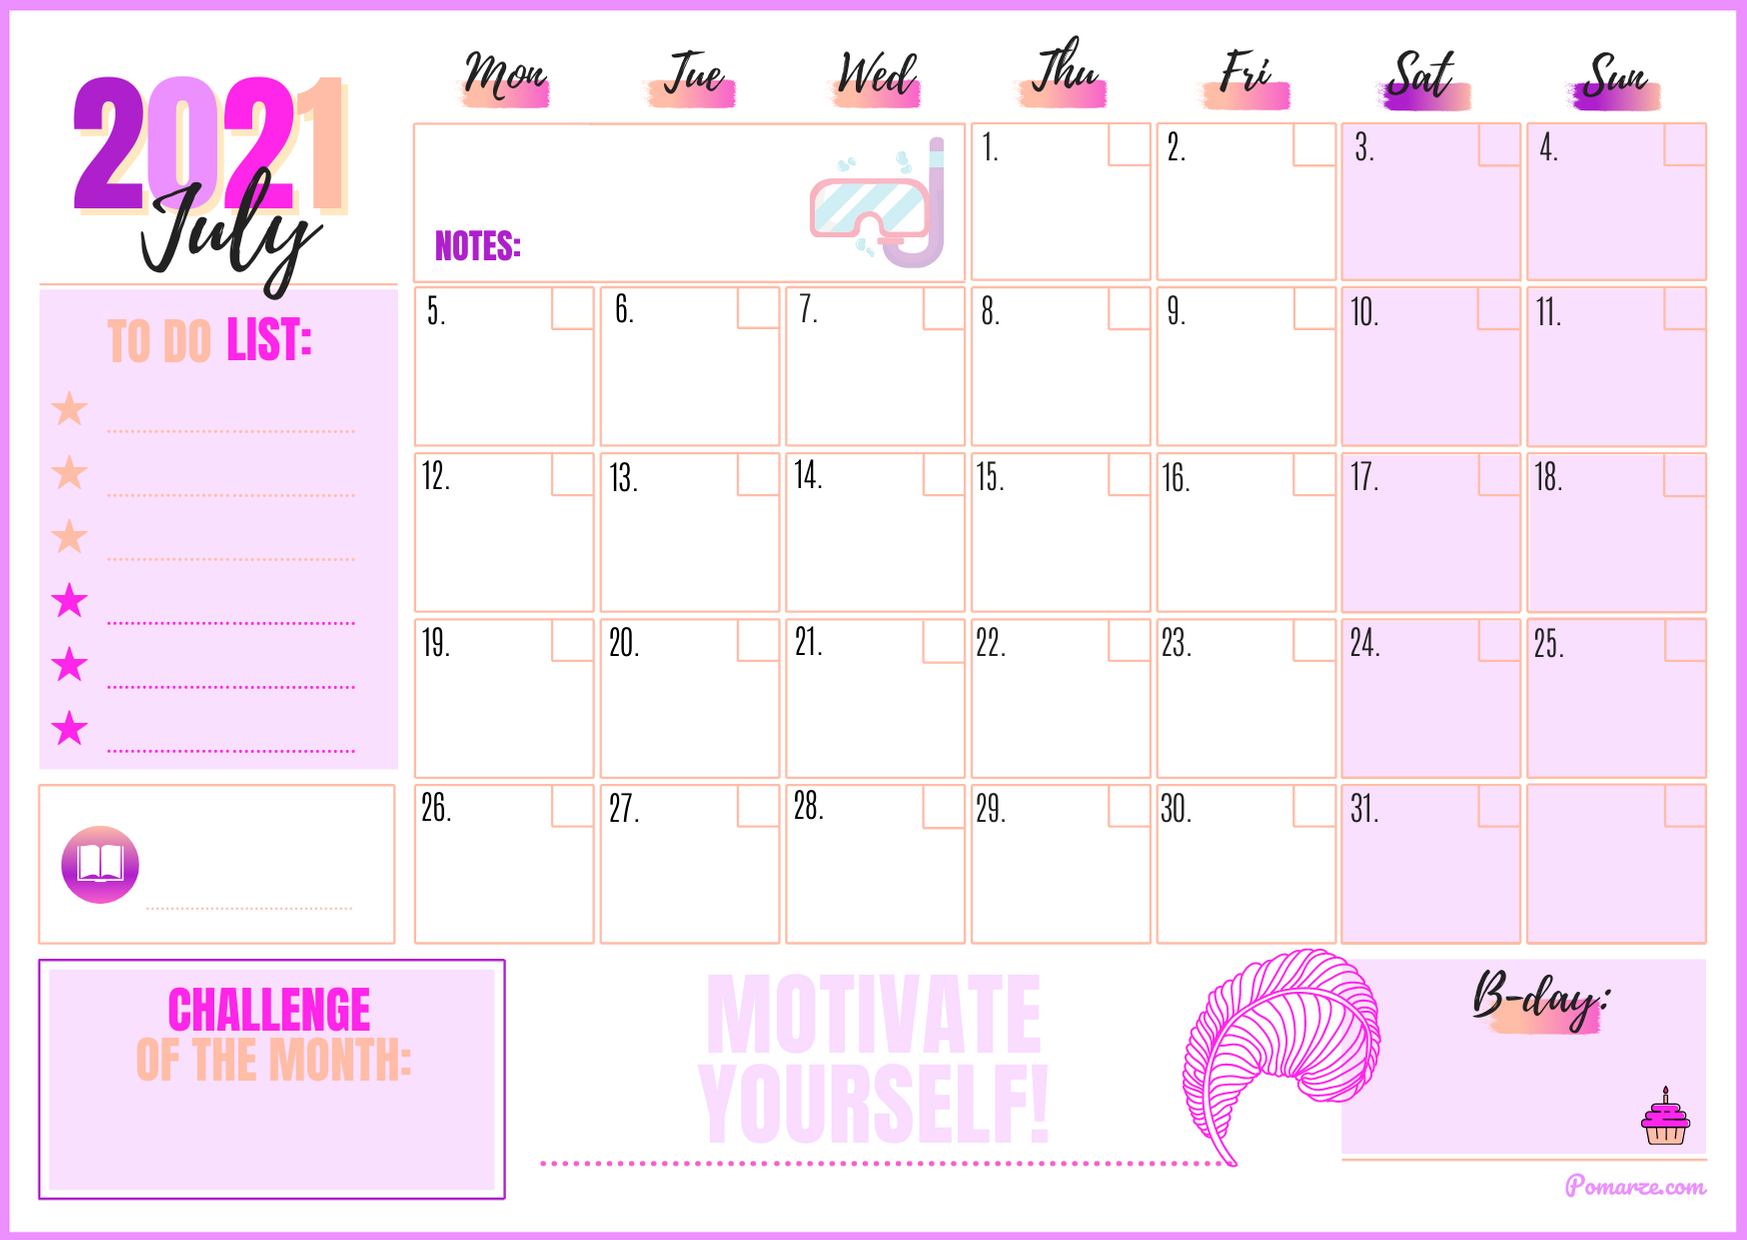 July 2021 monthly calendar weekly planner printable pink